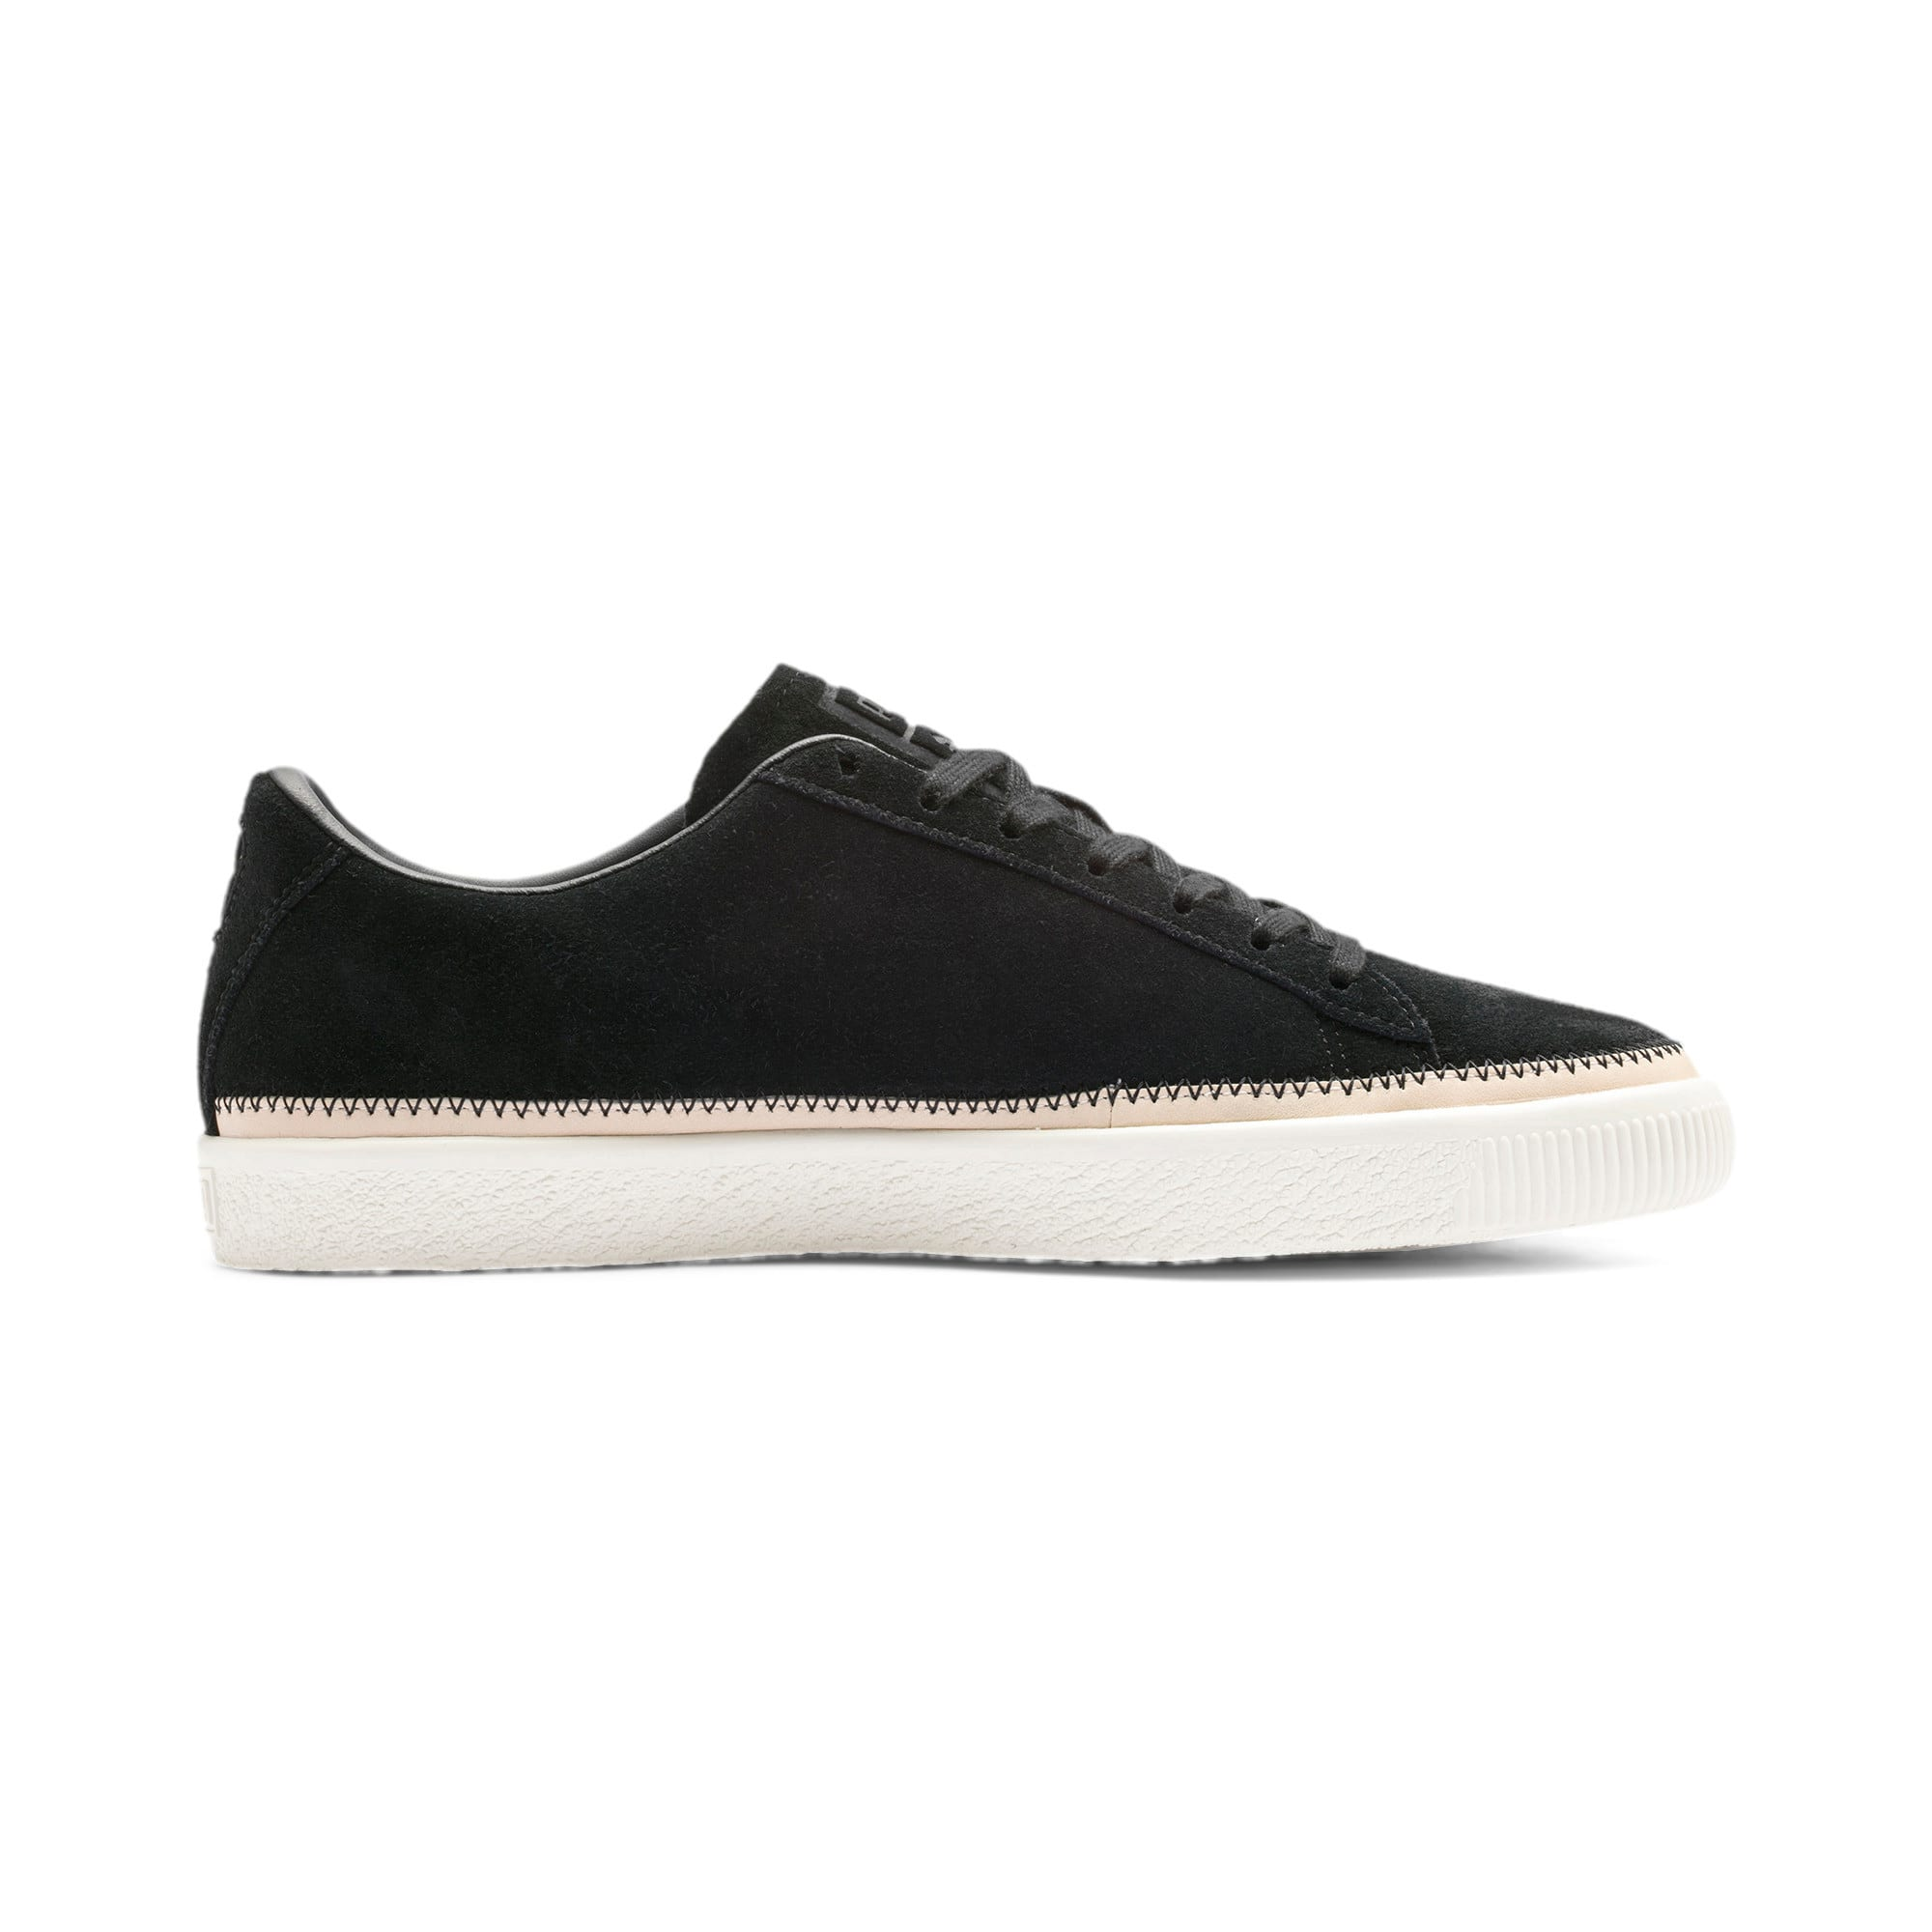 Thumbnail 6 of Suede Trim PRM Sneakers, Puma Black-Whisper White, medium